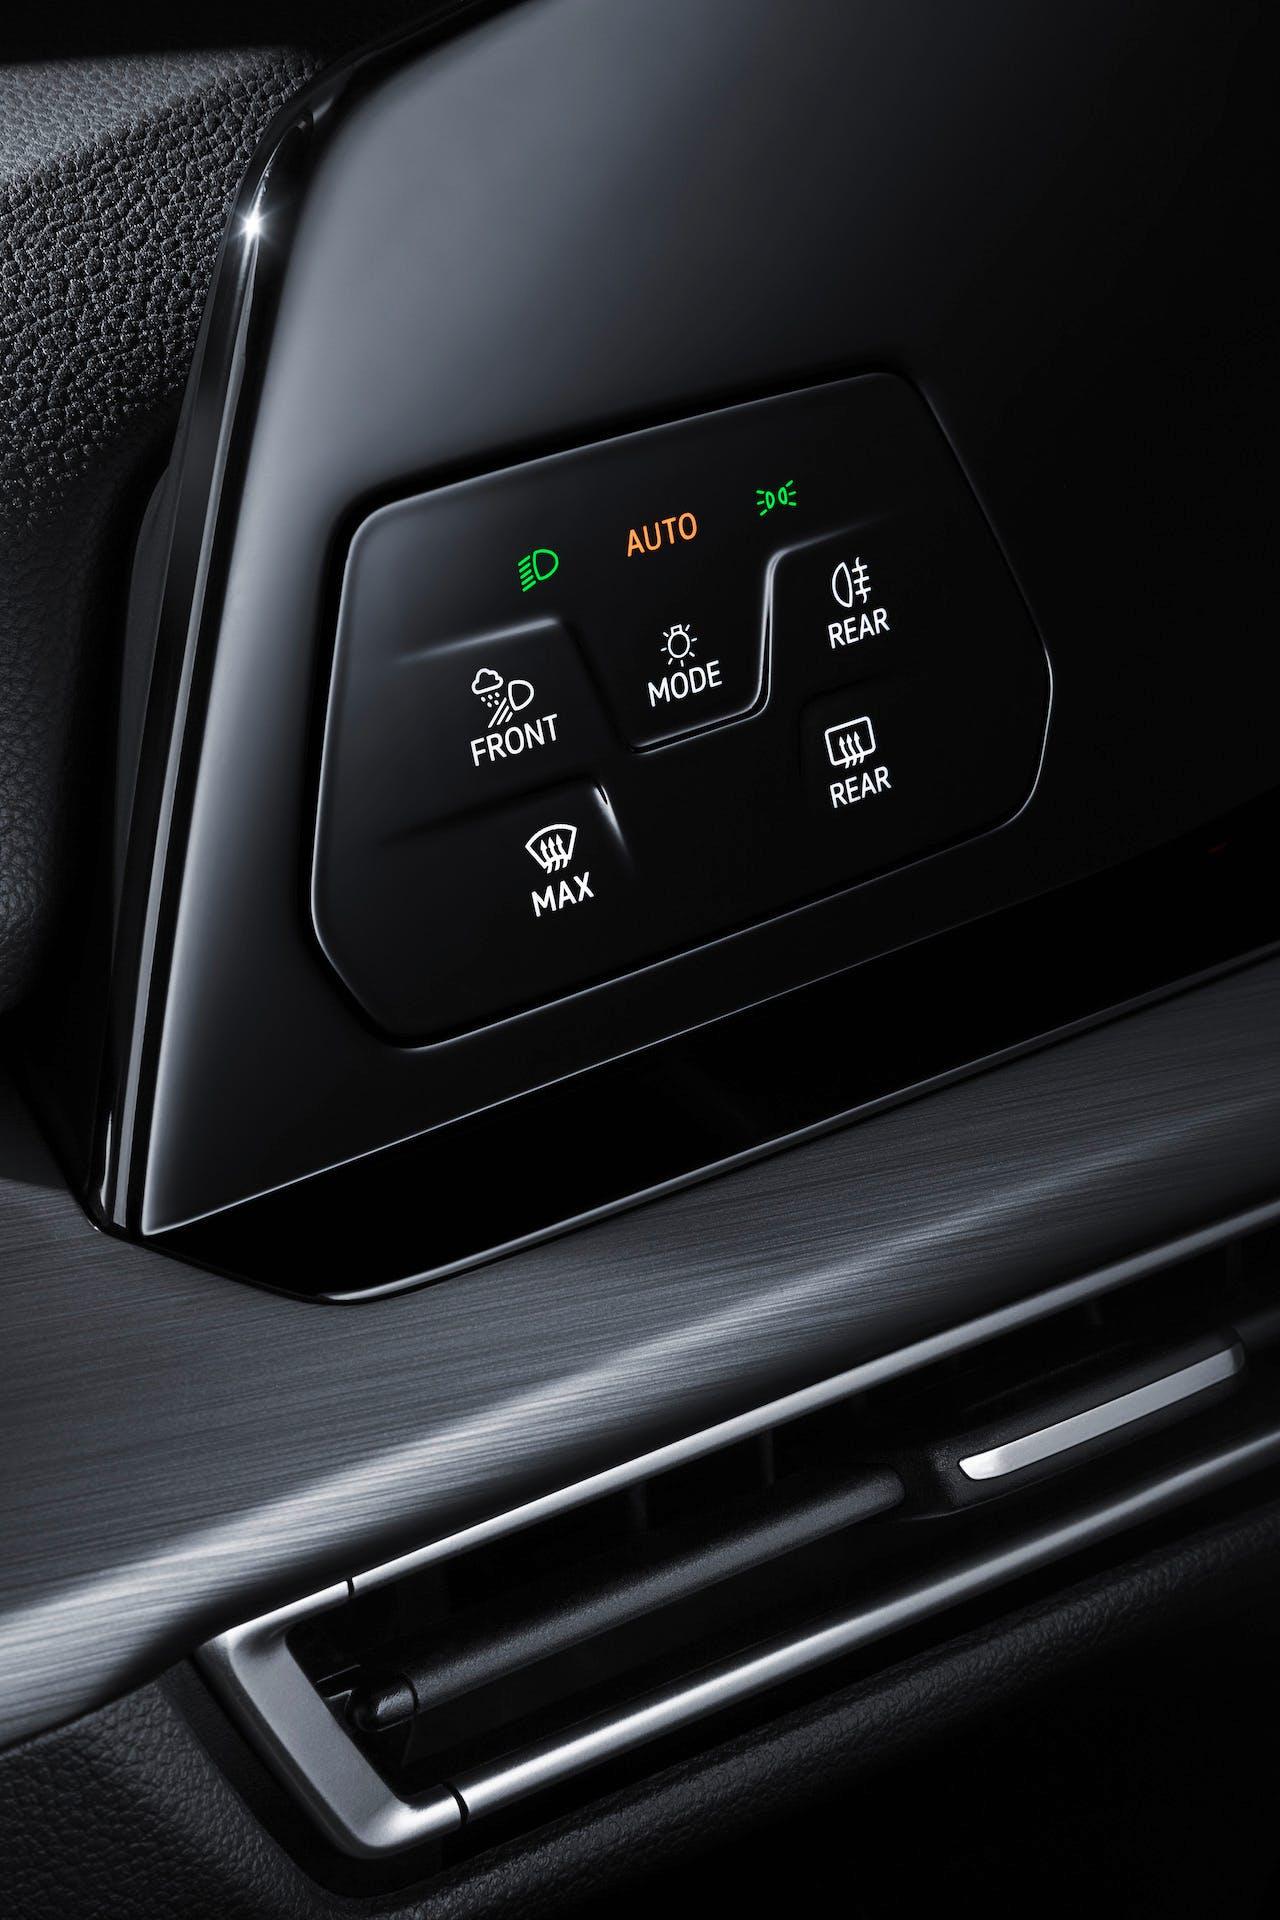 Nuova Volkswagen Golf 8 tasti volante